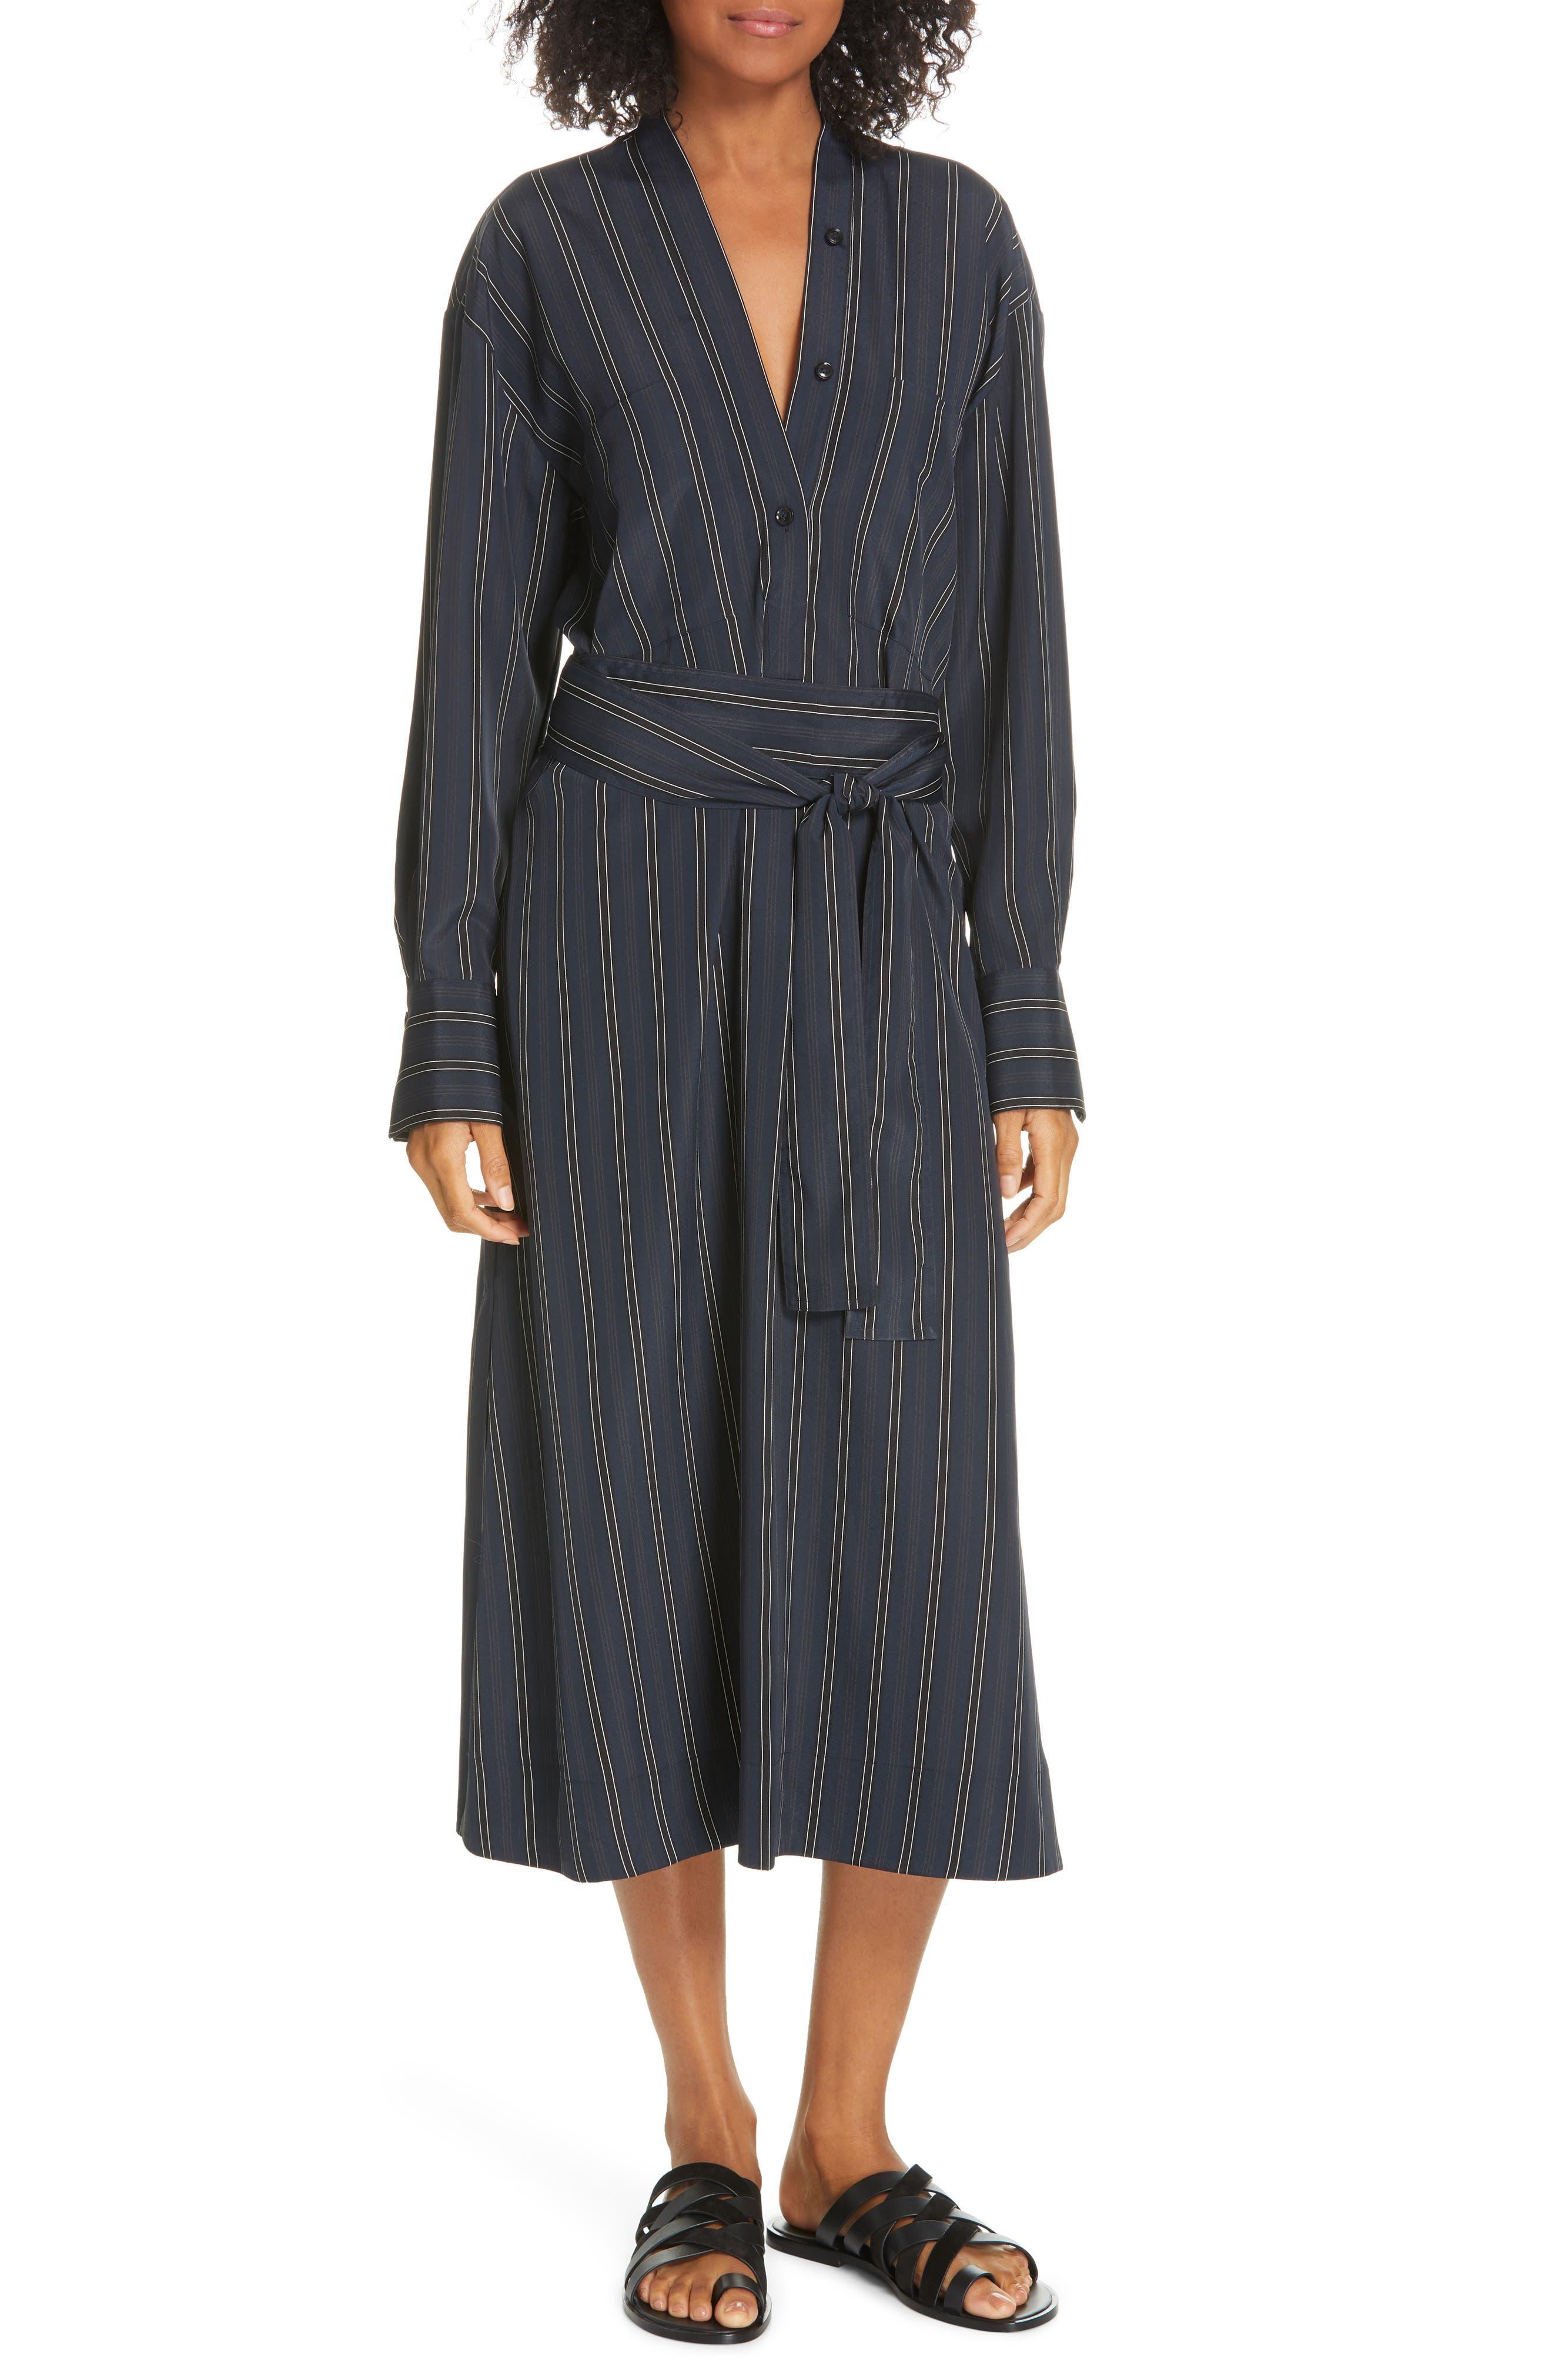 VINCE, Stripe Belted Midi Shirtdress, Main thumbnail 1, color, MARINE